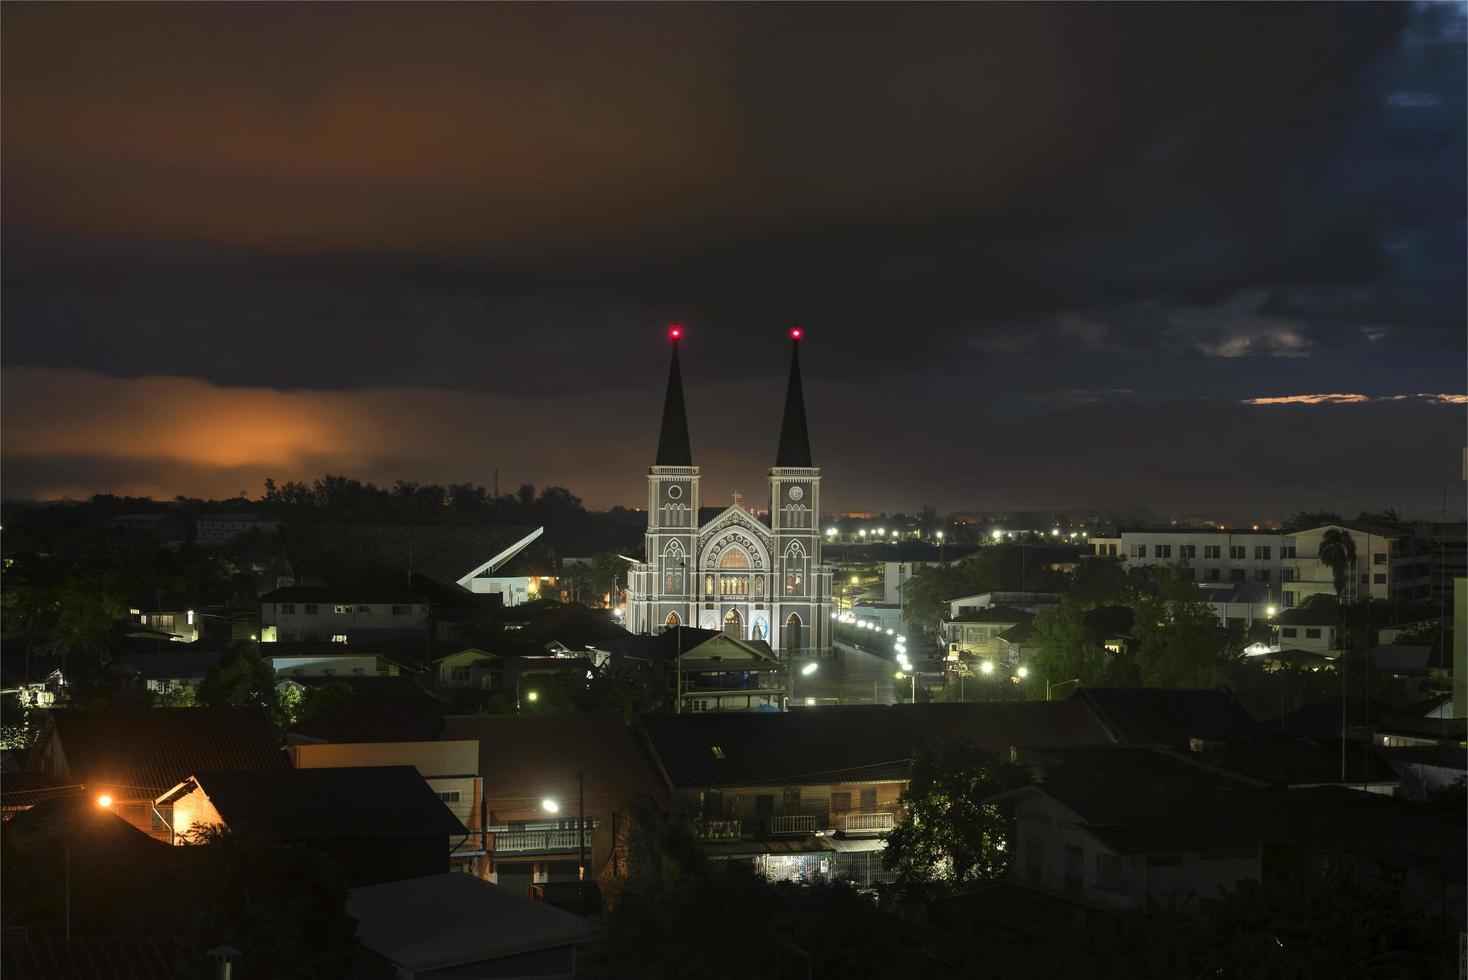 Catholic church at night photo